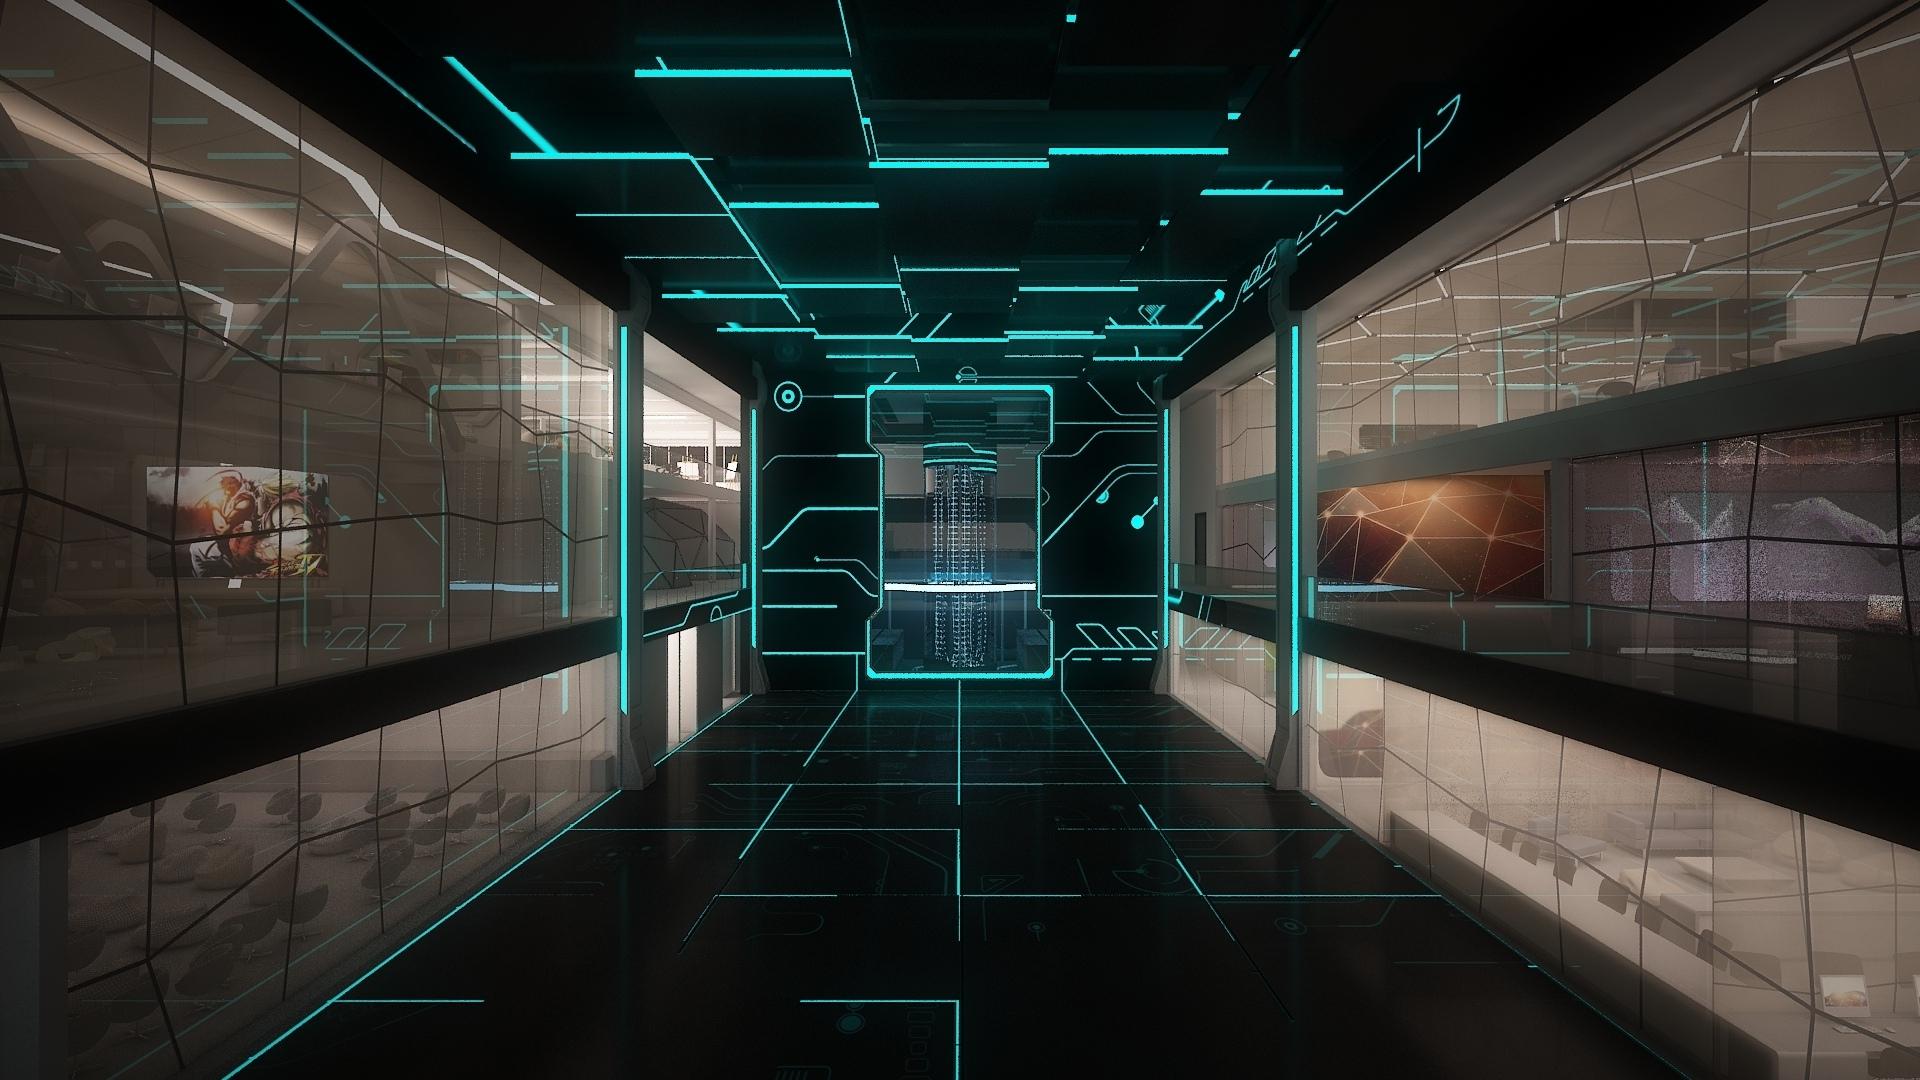 technology sci fi science computer futuristic wallpaper background 1920x1080